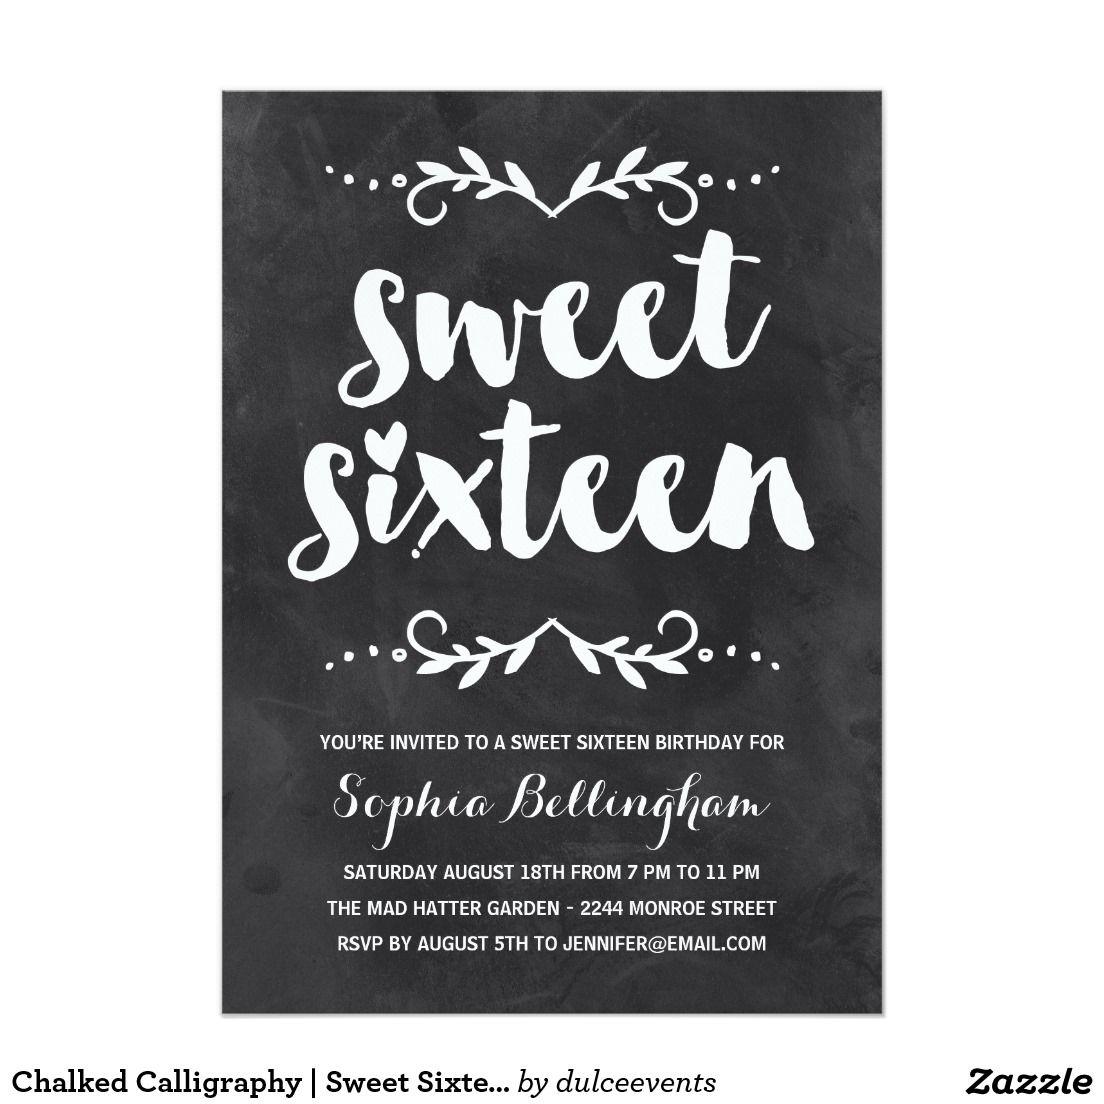 Chalkboard Calligraphy Sweet Six Birthday Invitation